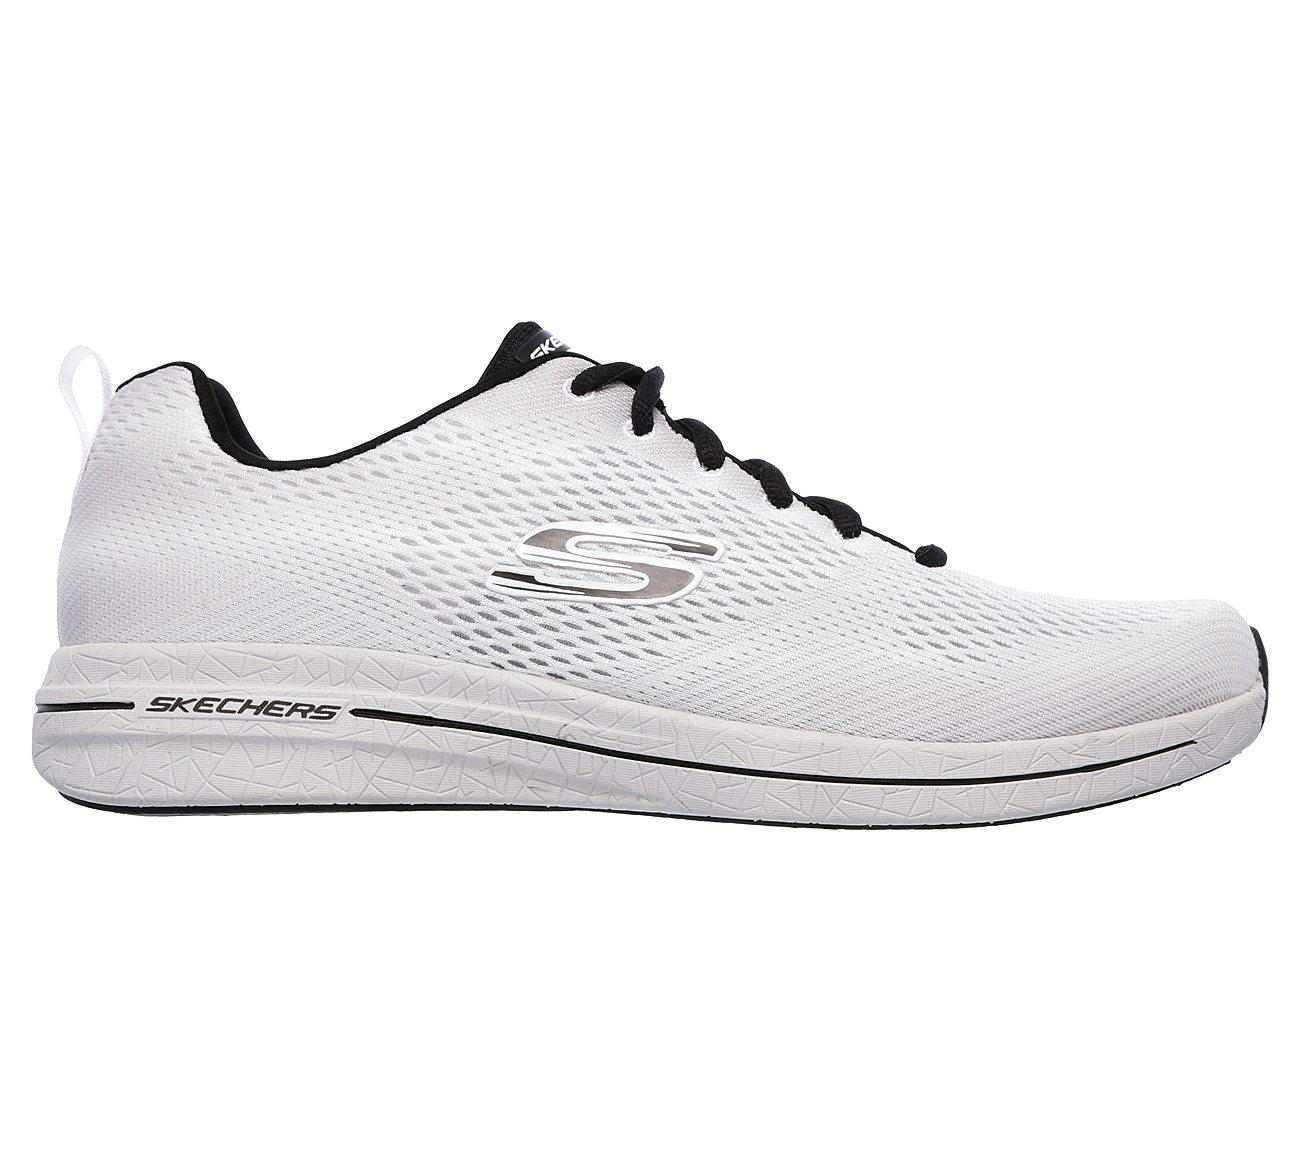 skechers mens shoes white